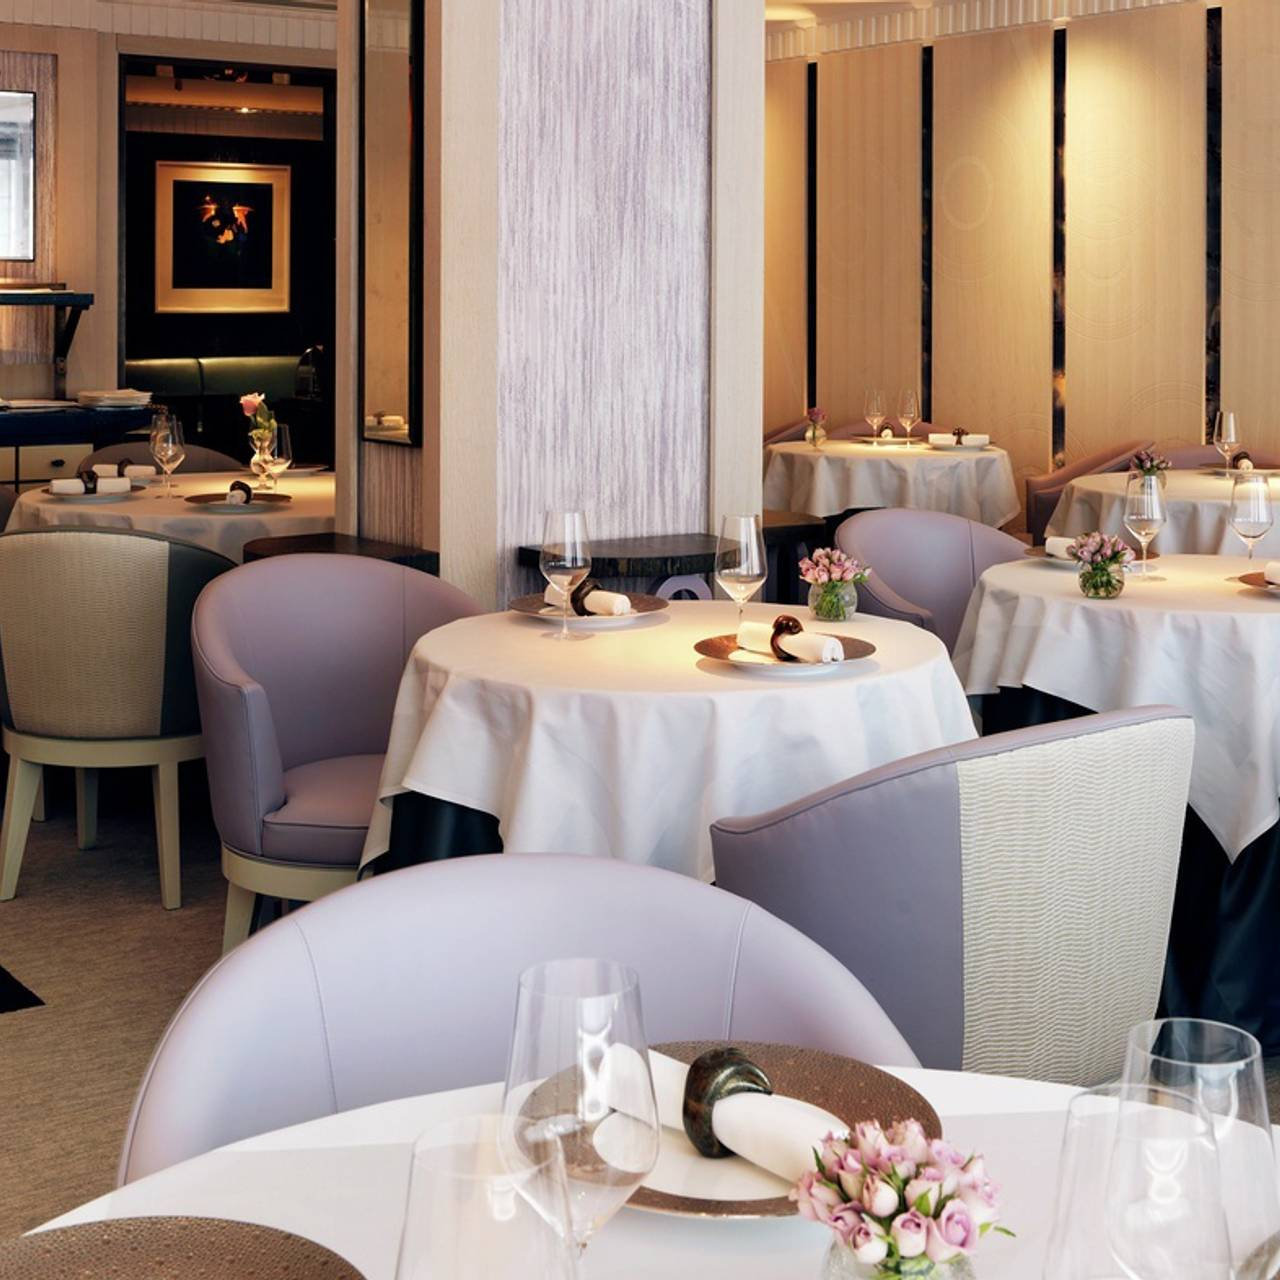 Restaurant Gordon Ramsay London Opentable